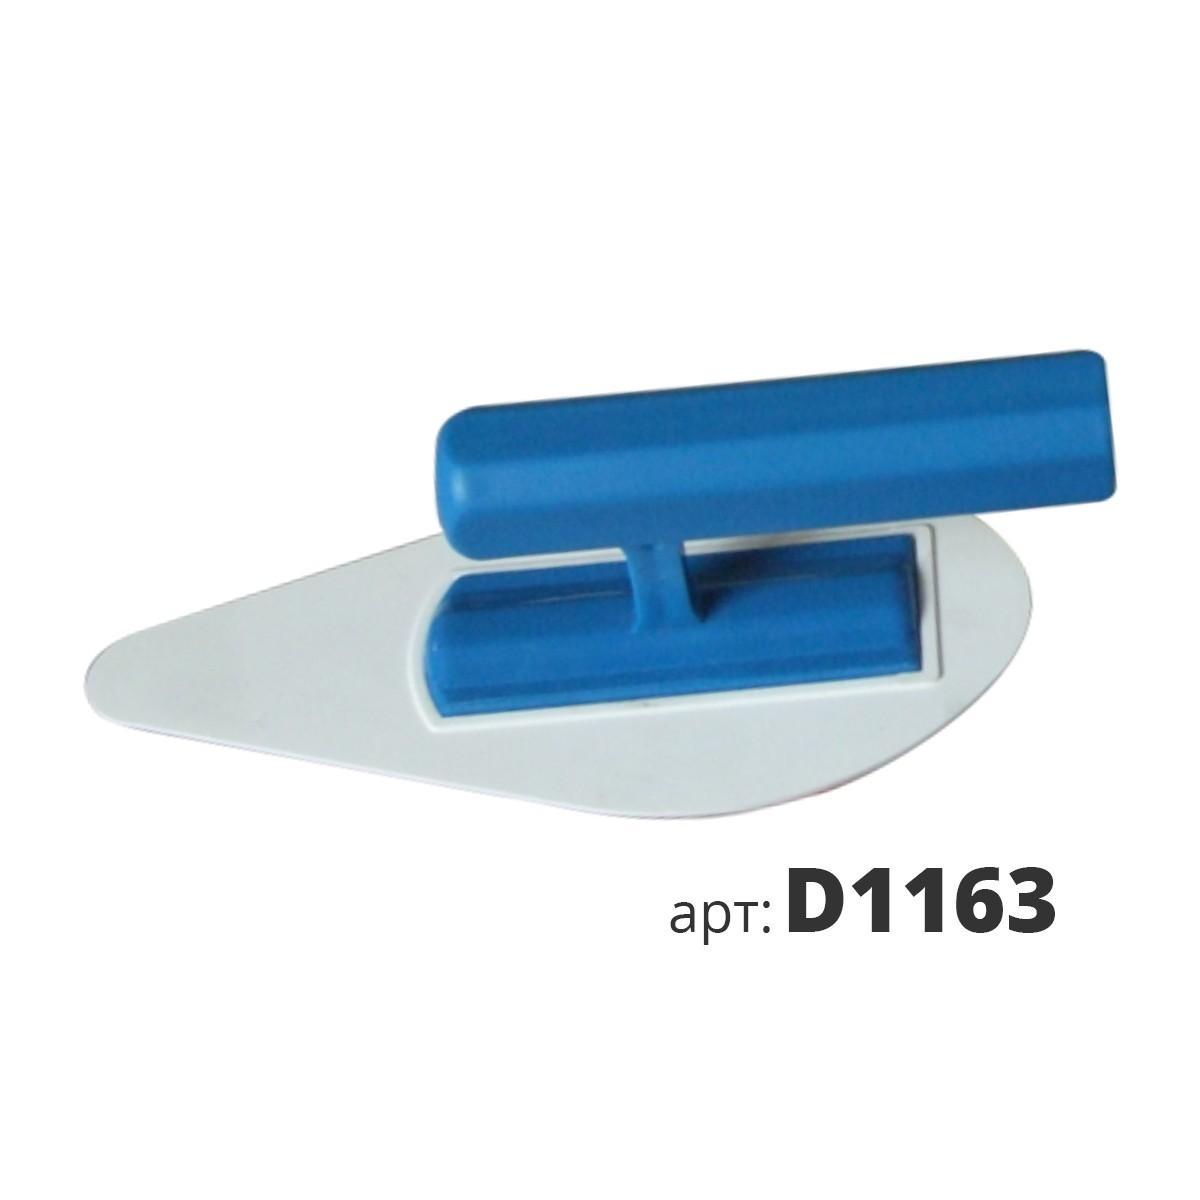 Кельма пластиковая капля D1163